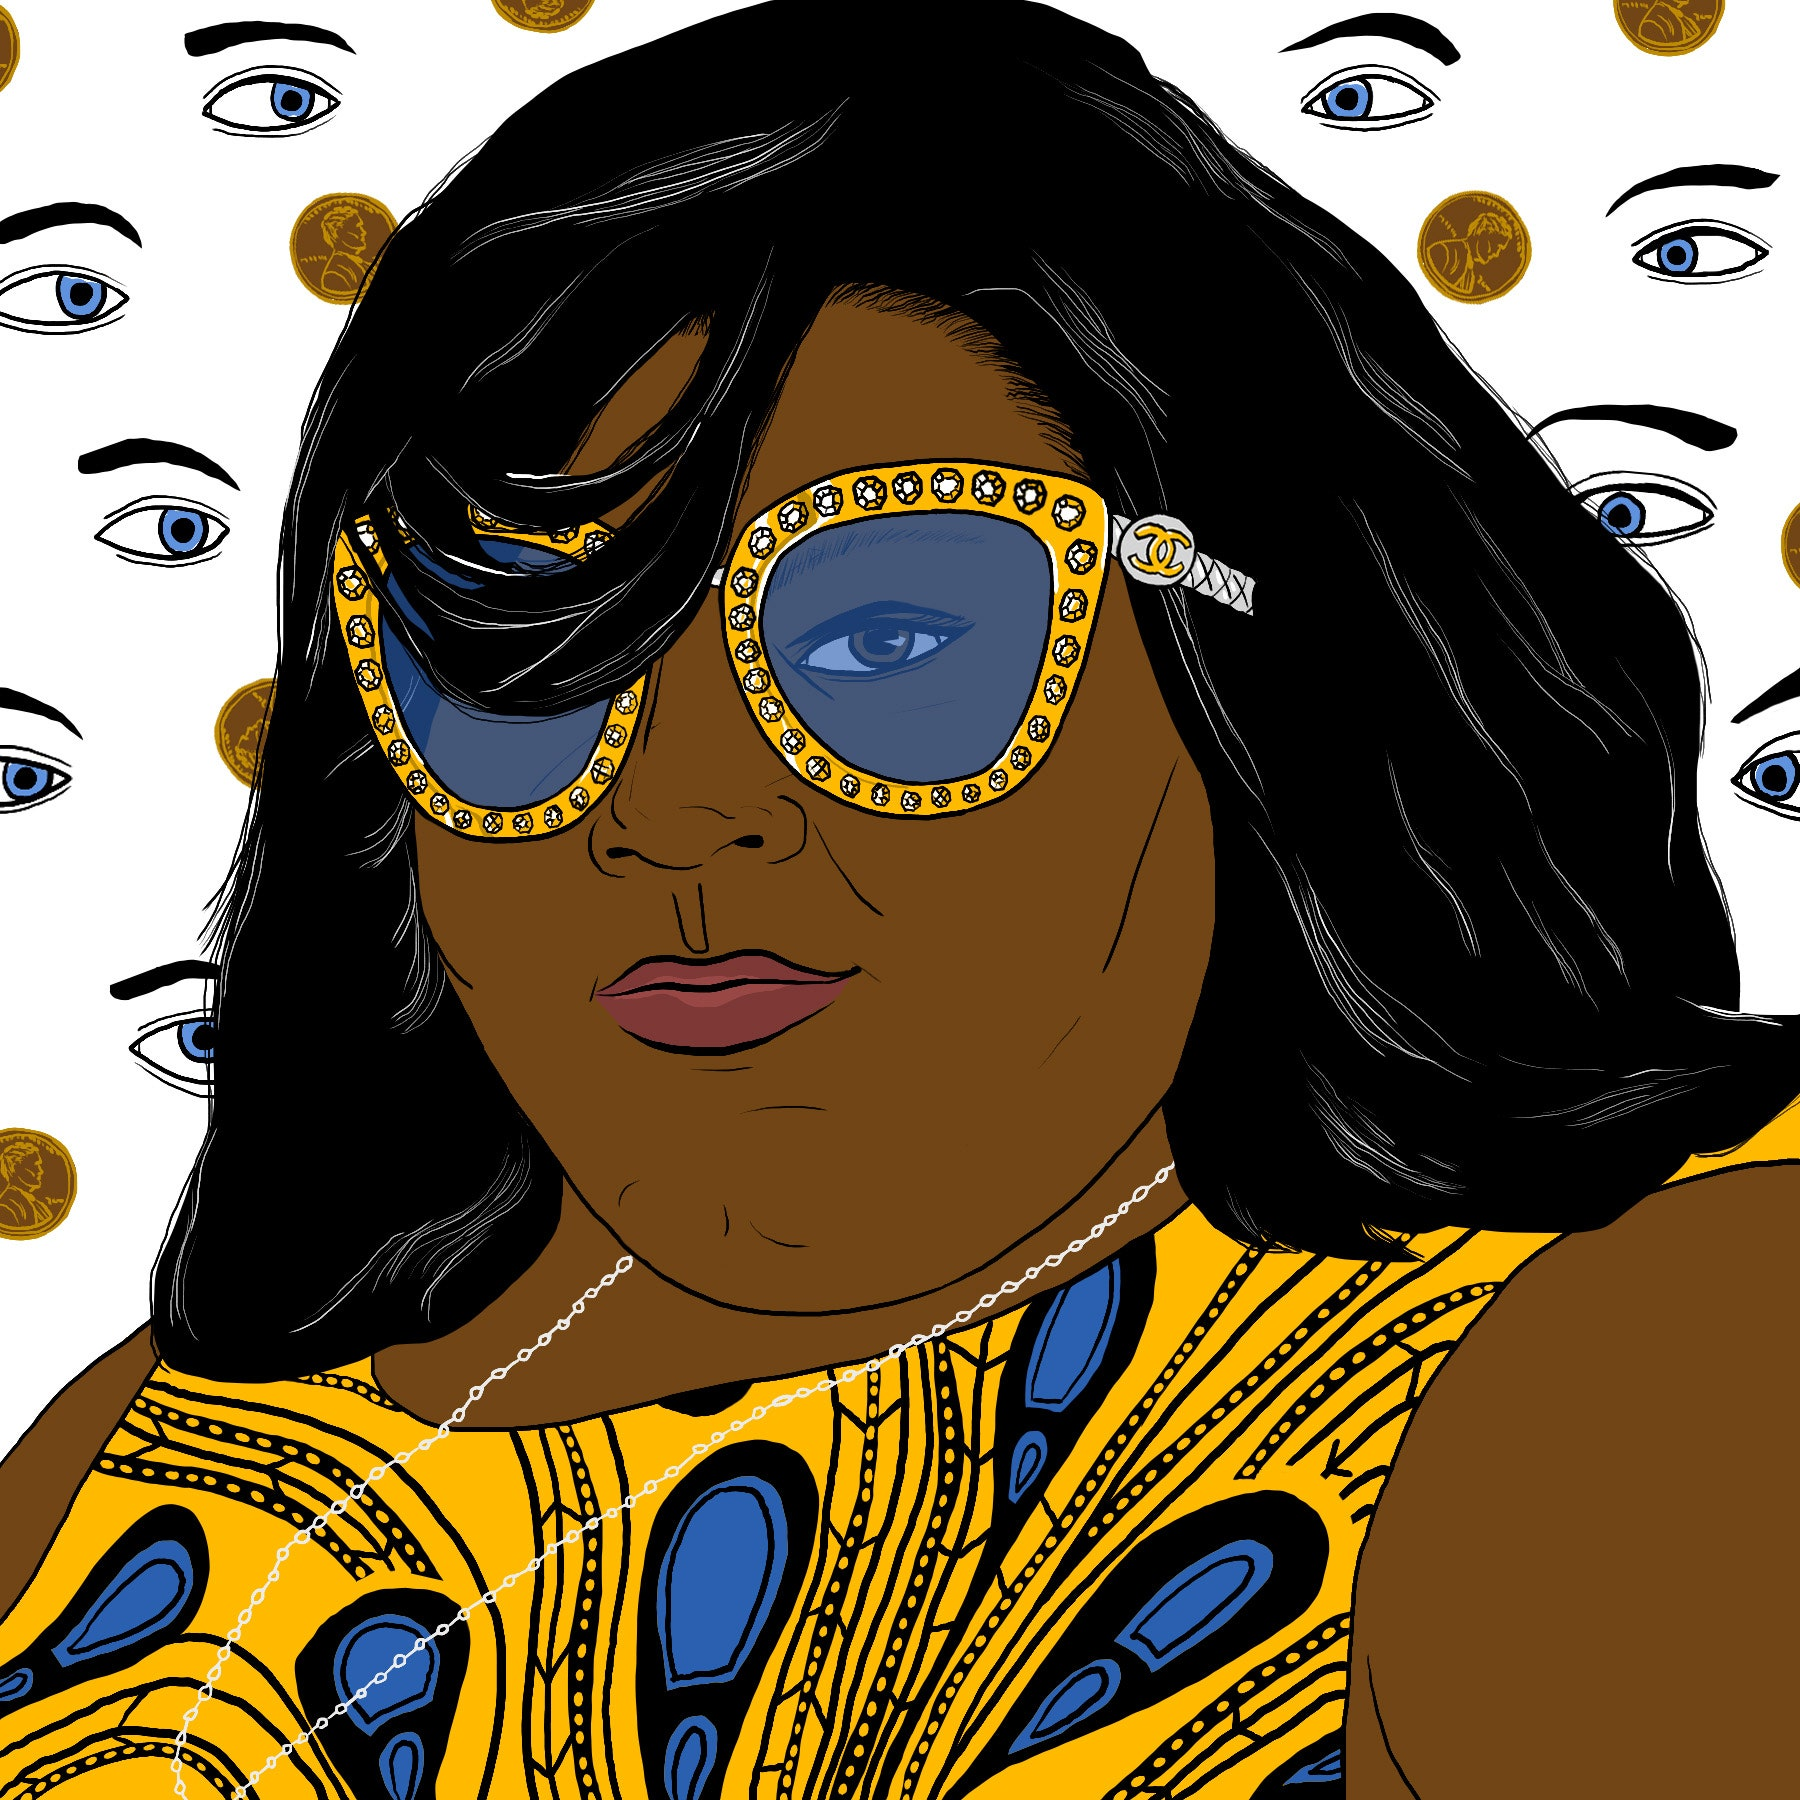 When Gabourey Sidibe Got Dissed By a Saleswoman